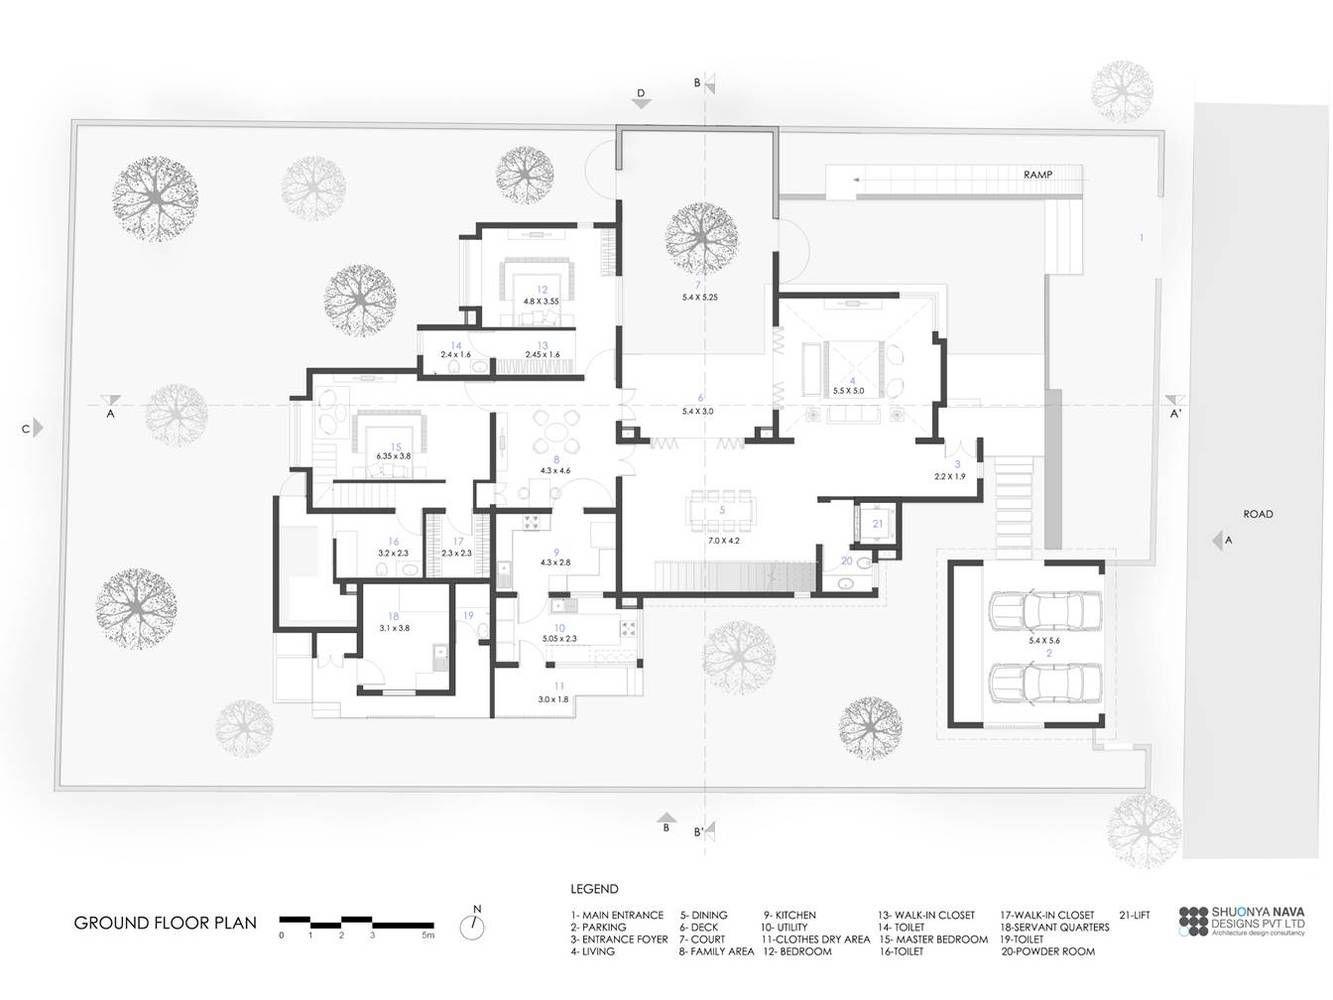 Gallery Of Farm House Shuonya Nava Designs 26 In 2020 Ground Floor Plan Design House